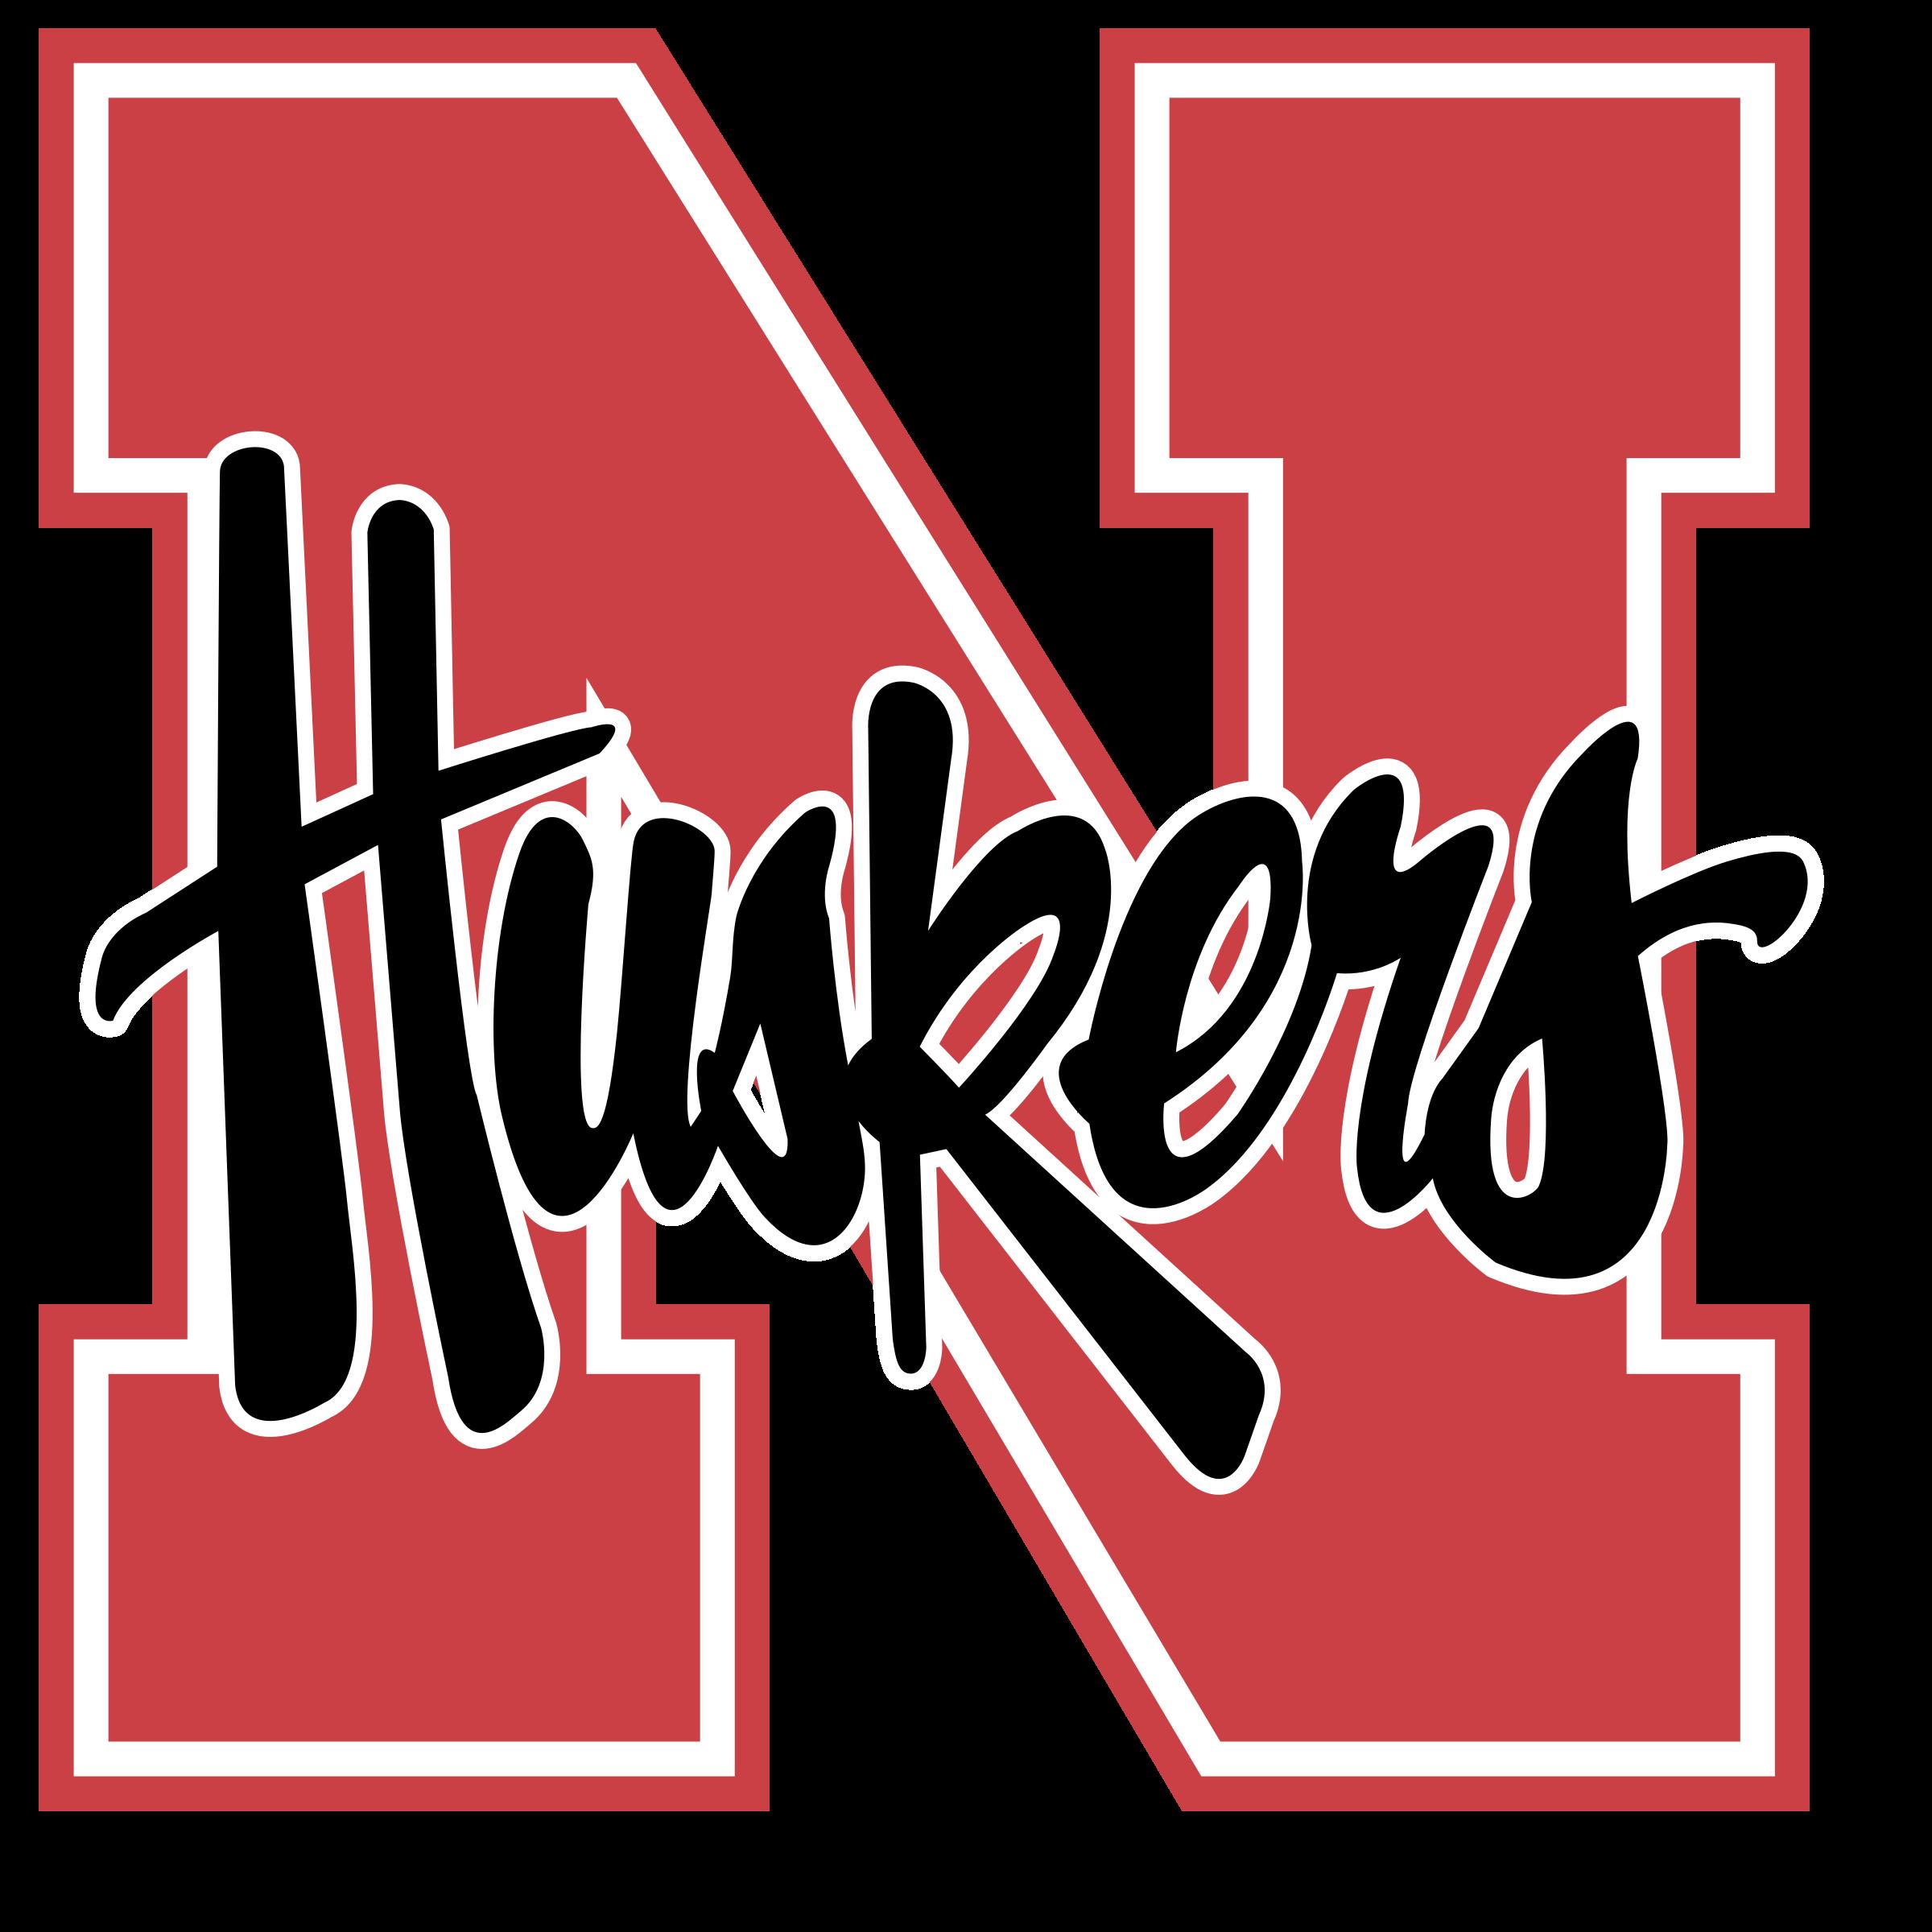 Nebraska Corn Huskers Logo PNG Transparent & SVG Vector - Freebie Supply